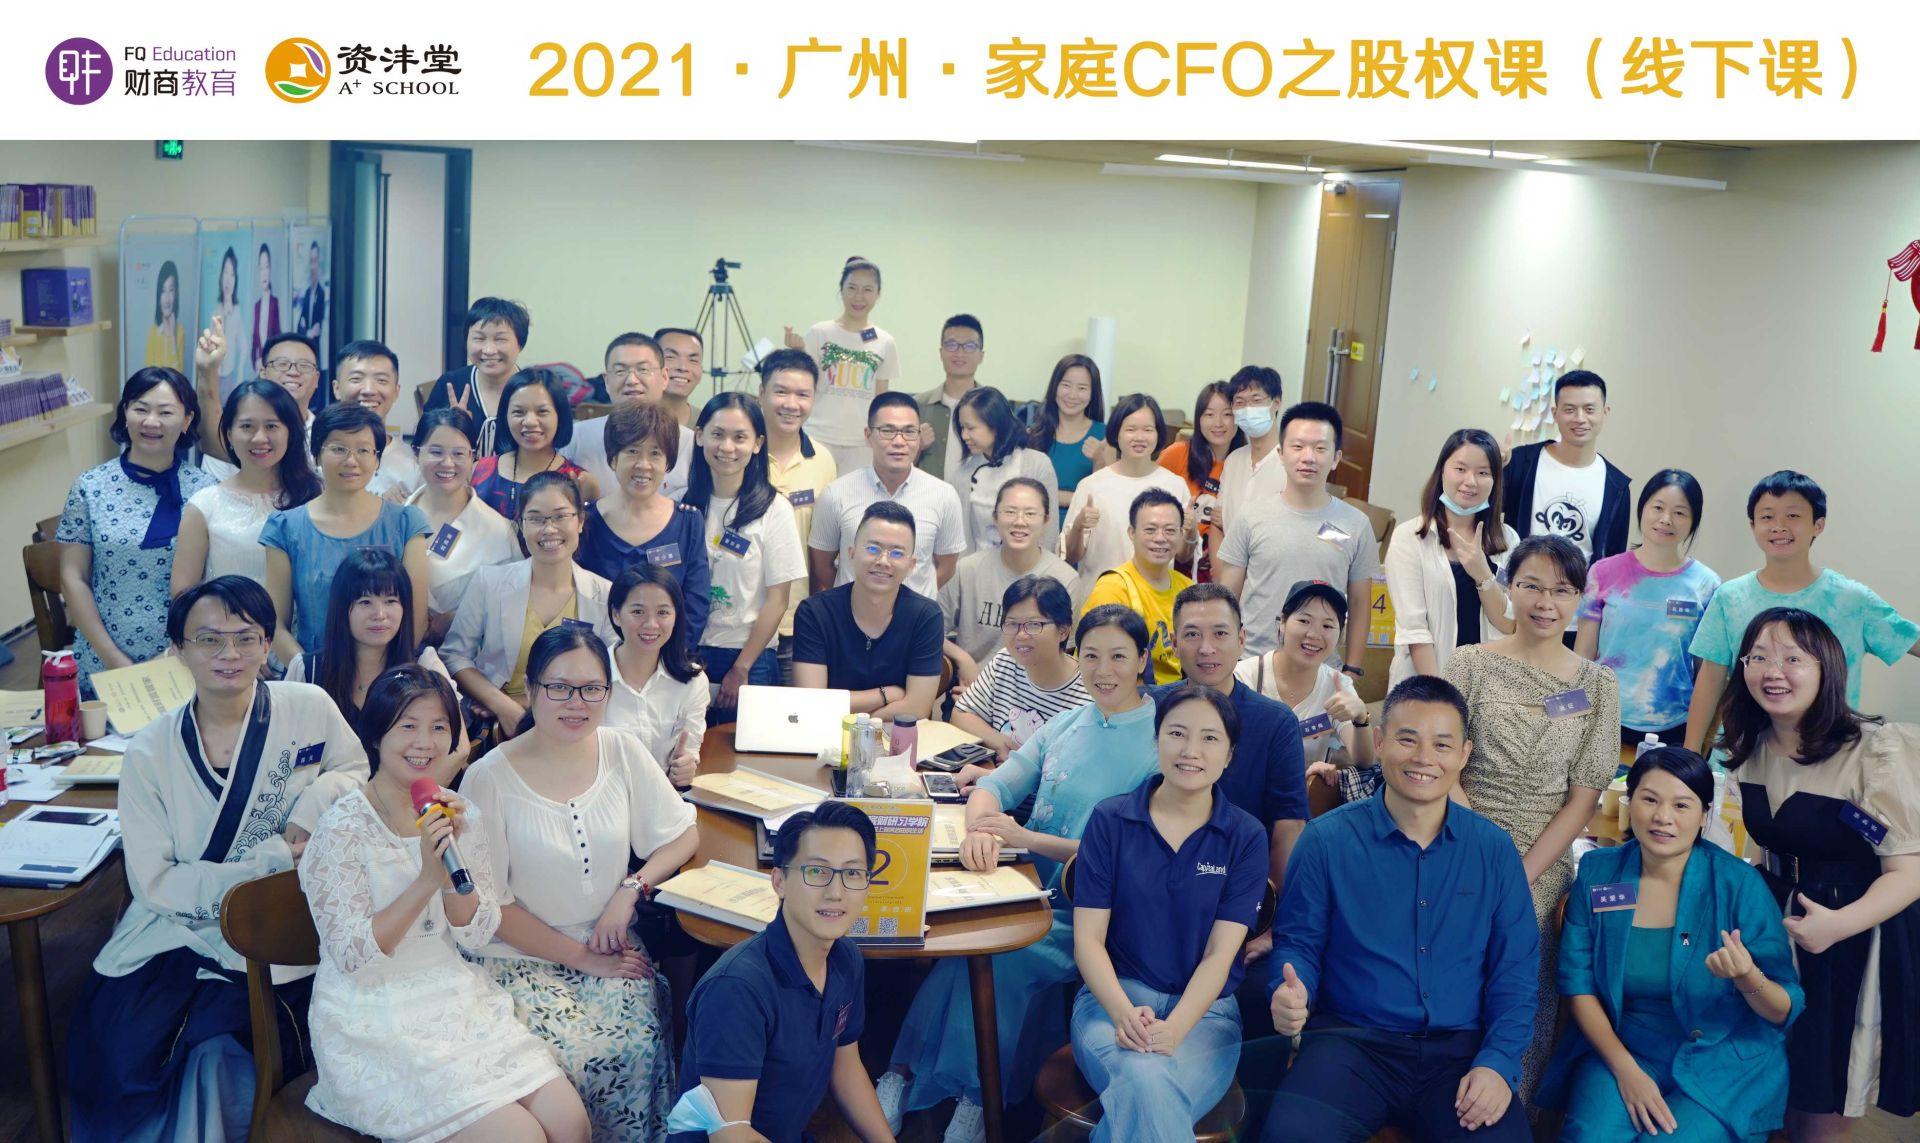 2021.8.21-8.22 | CFO股权、家庭投资公司、黄金线下实操课程回顾